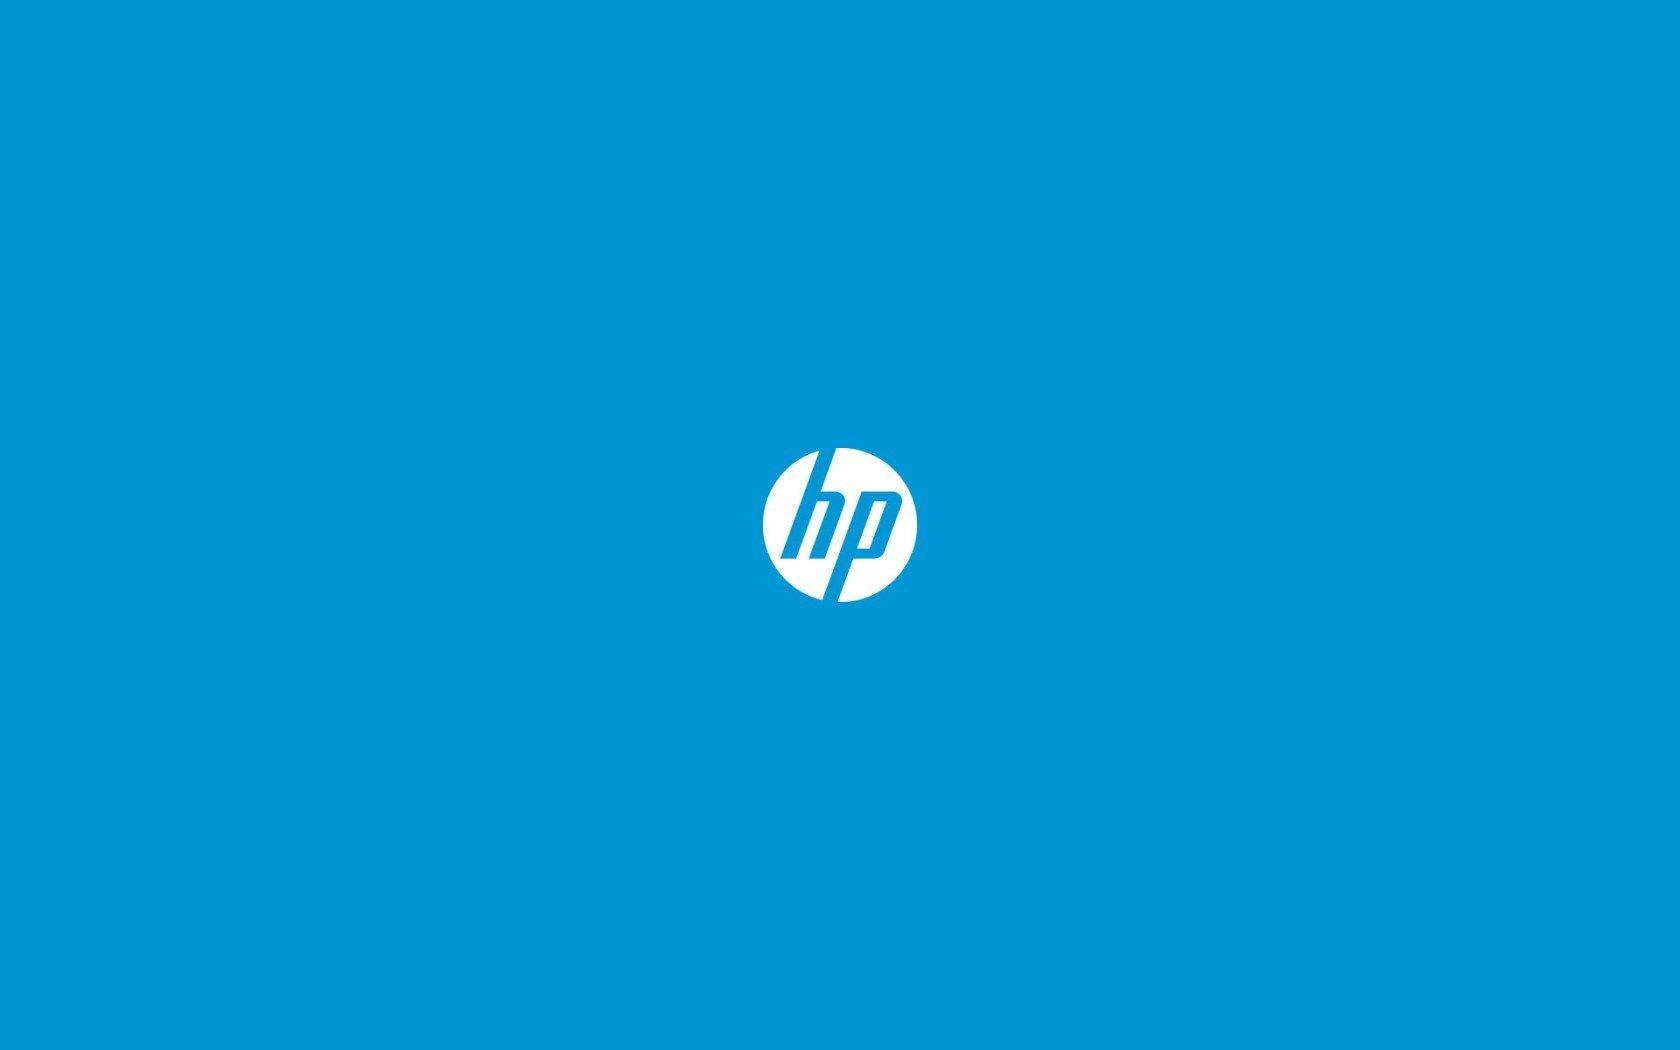 hp logo blue hd - photo #3